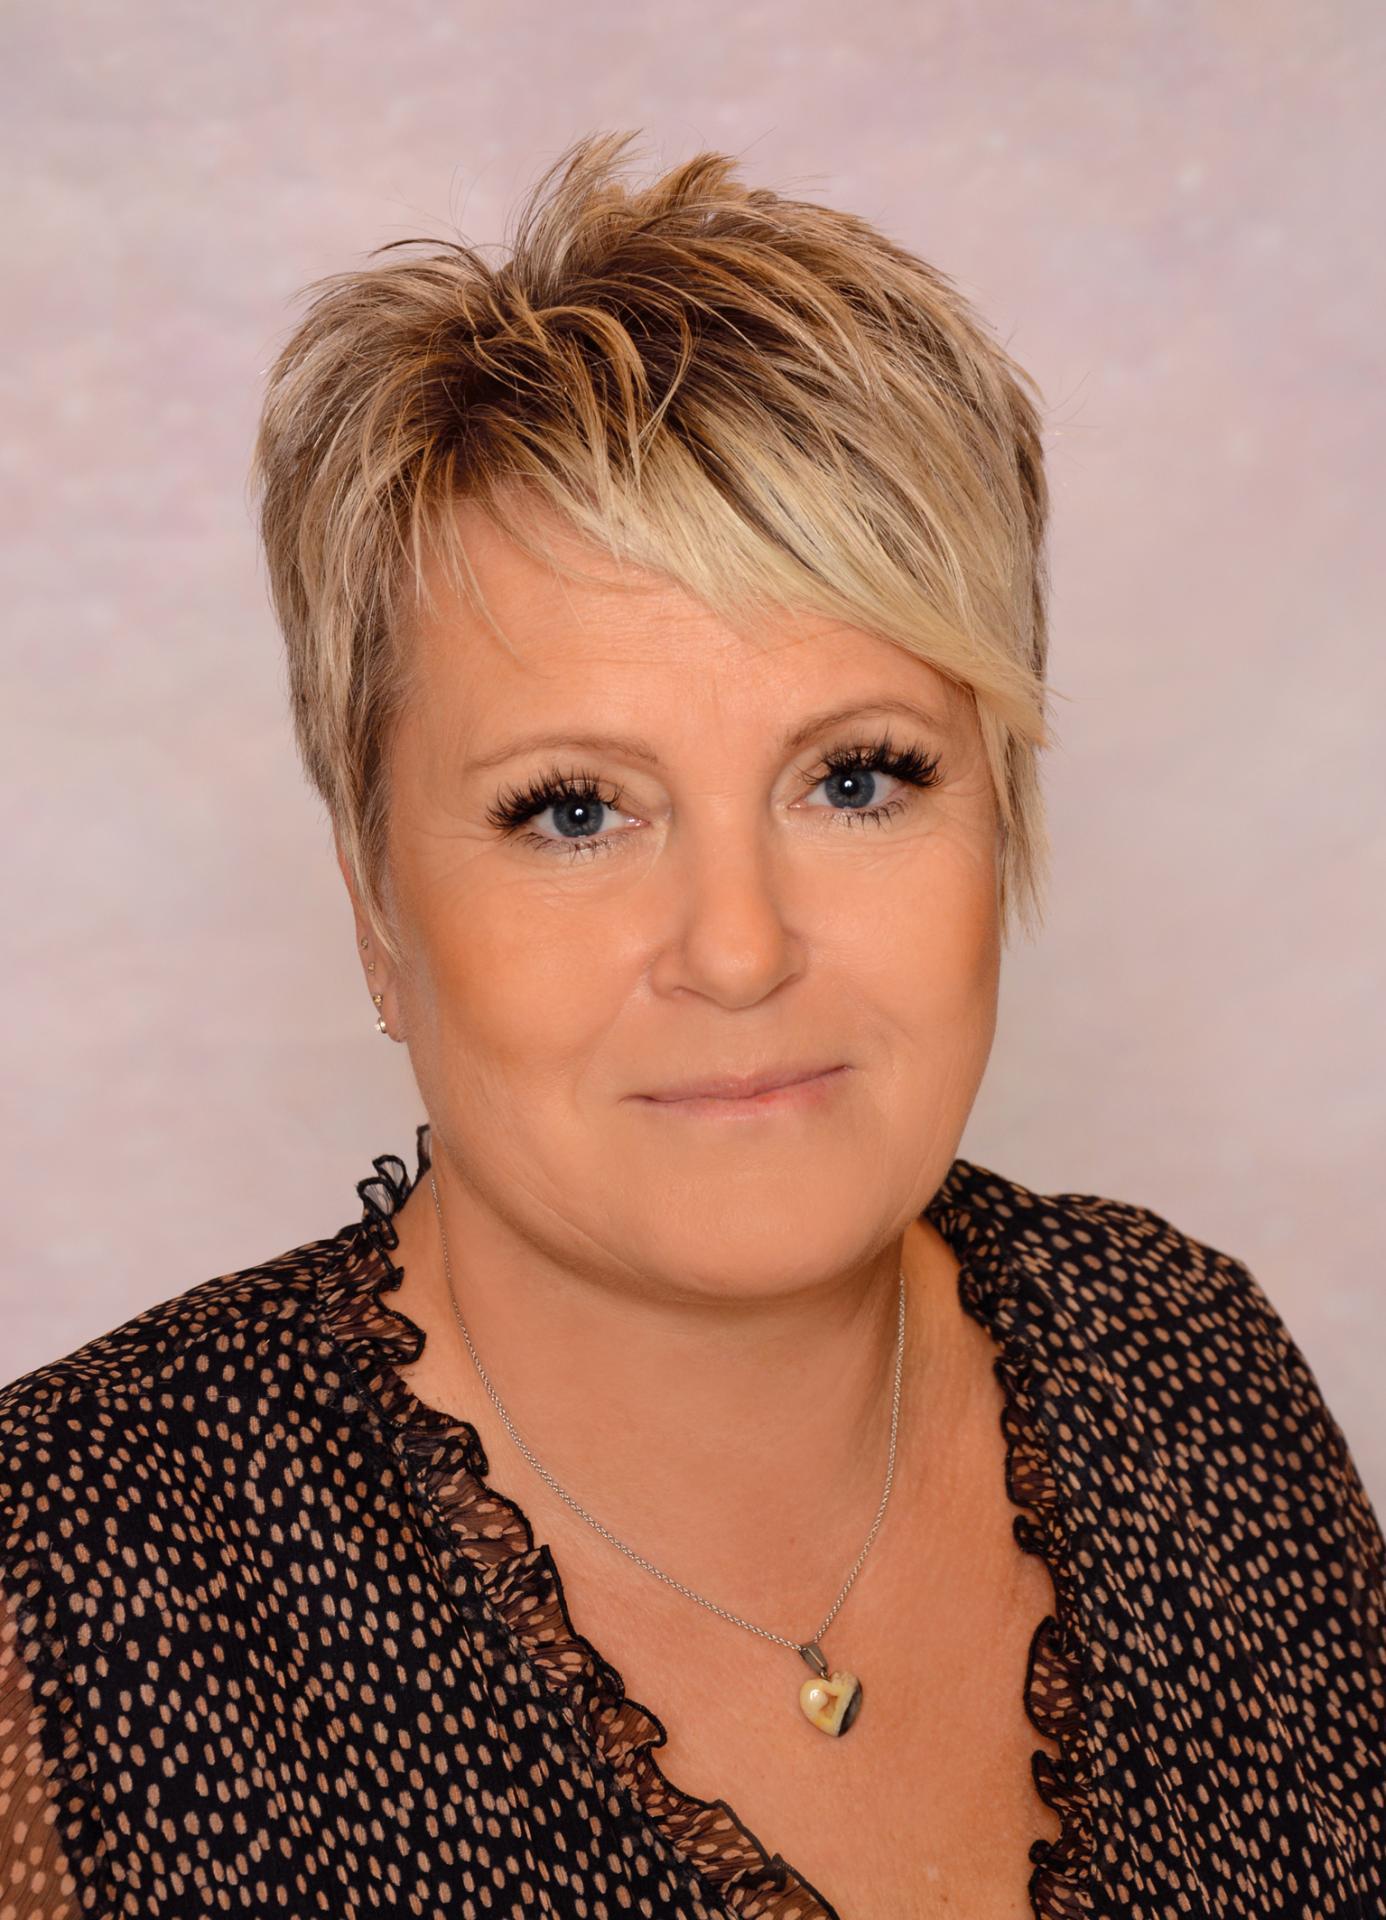 Sabine Förster